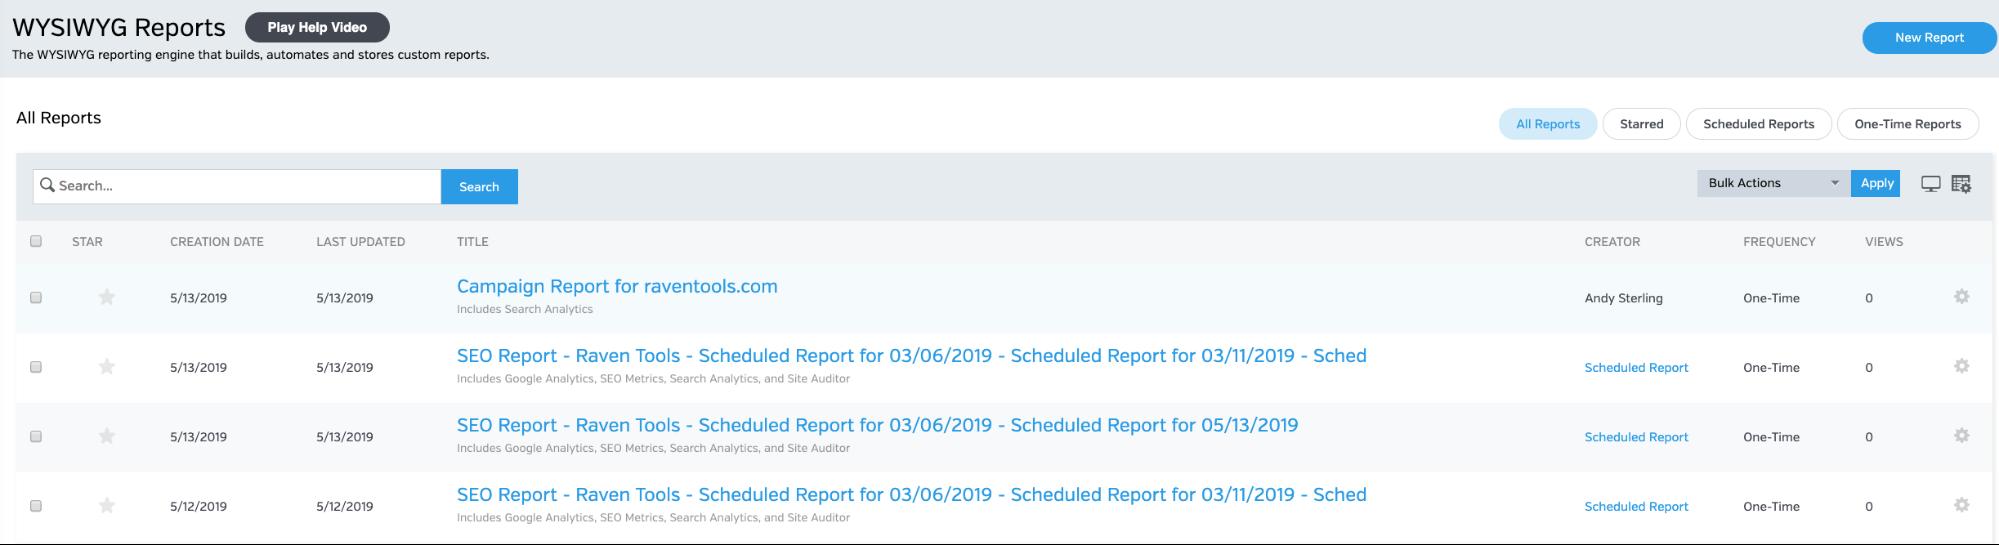 Marketing Reports - Create & Send Custom Marketing Reports ...